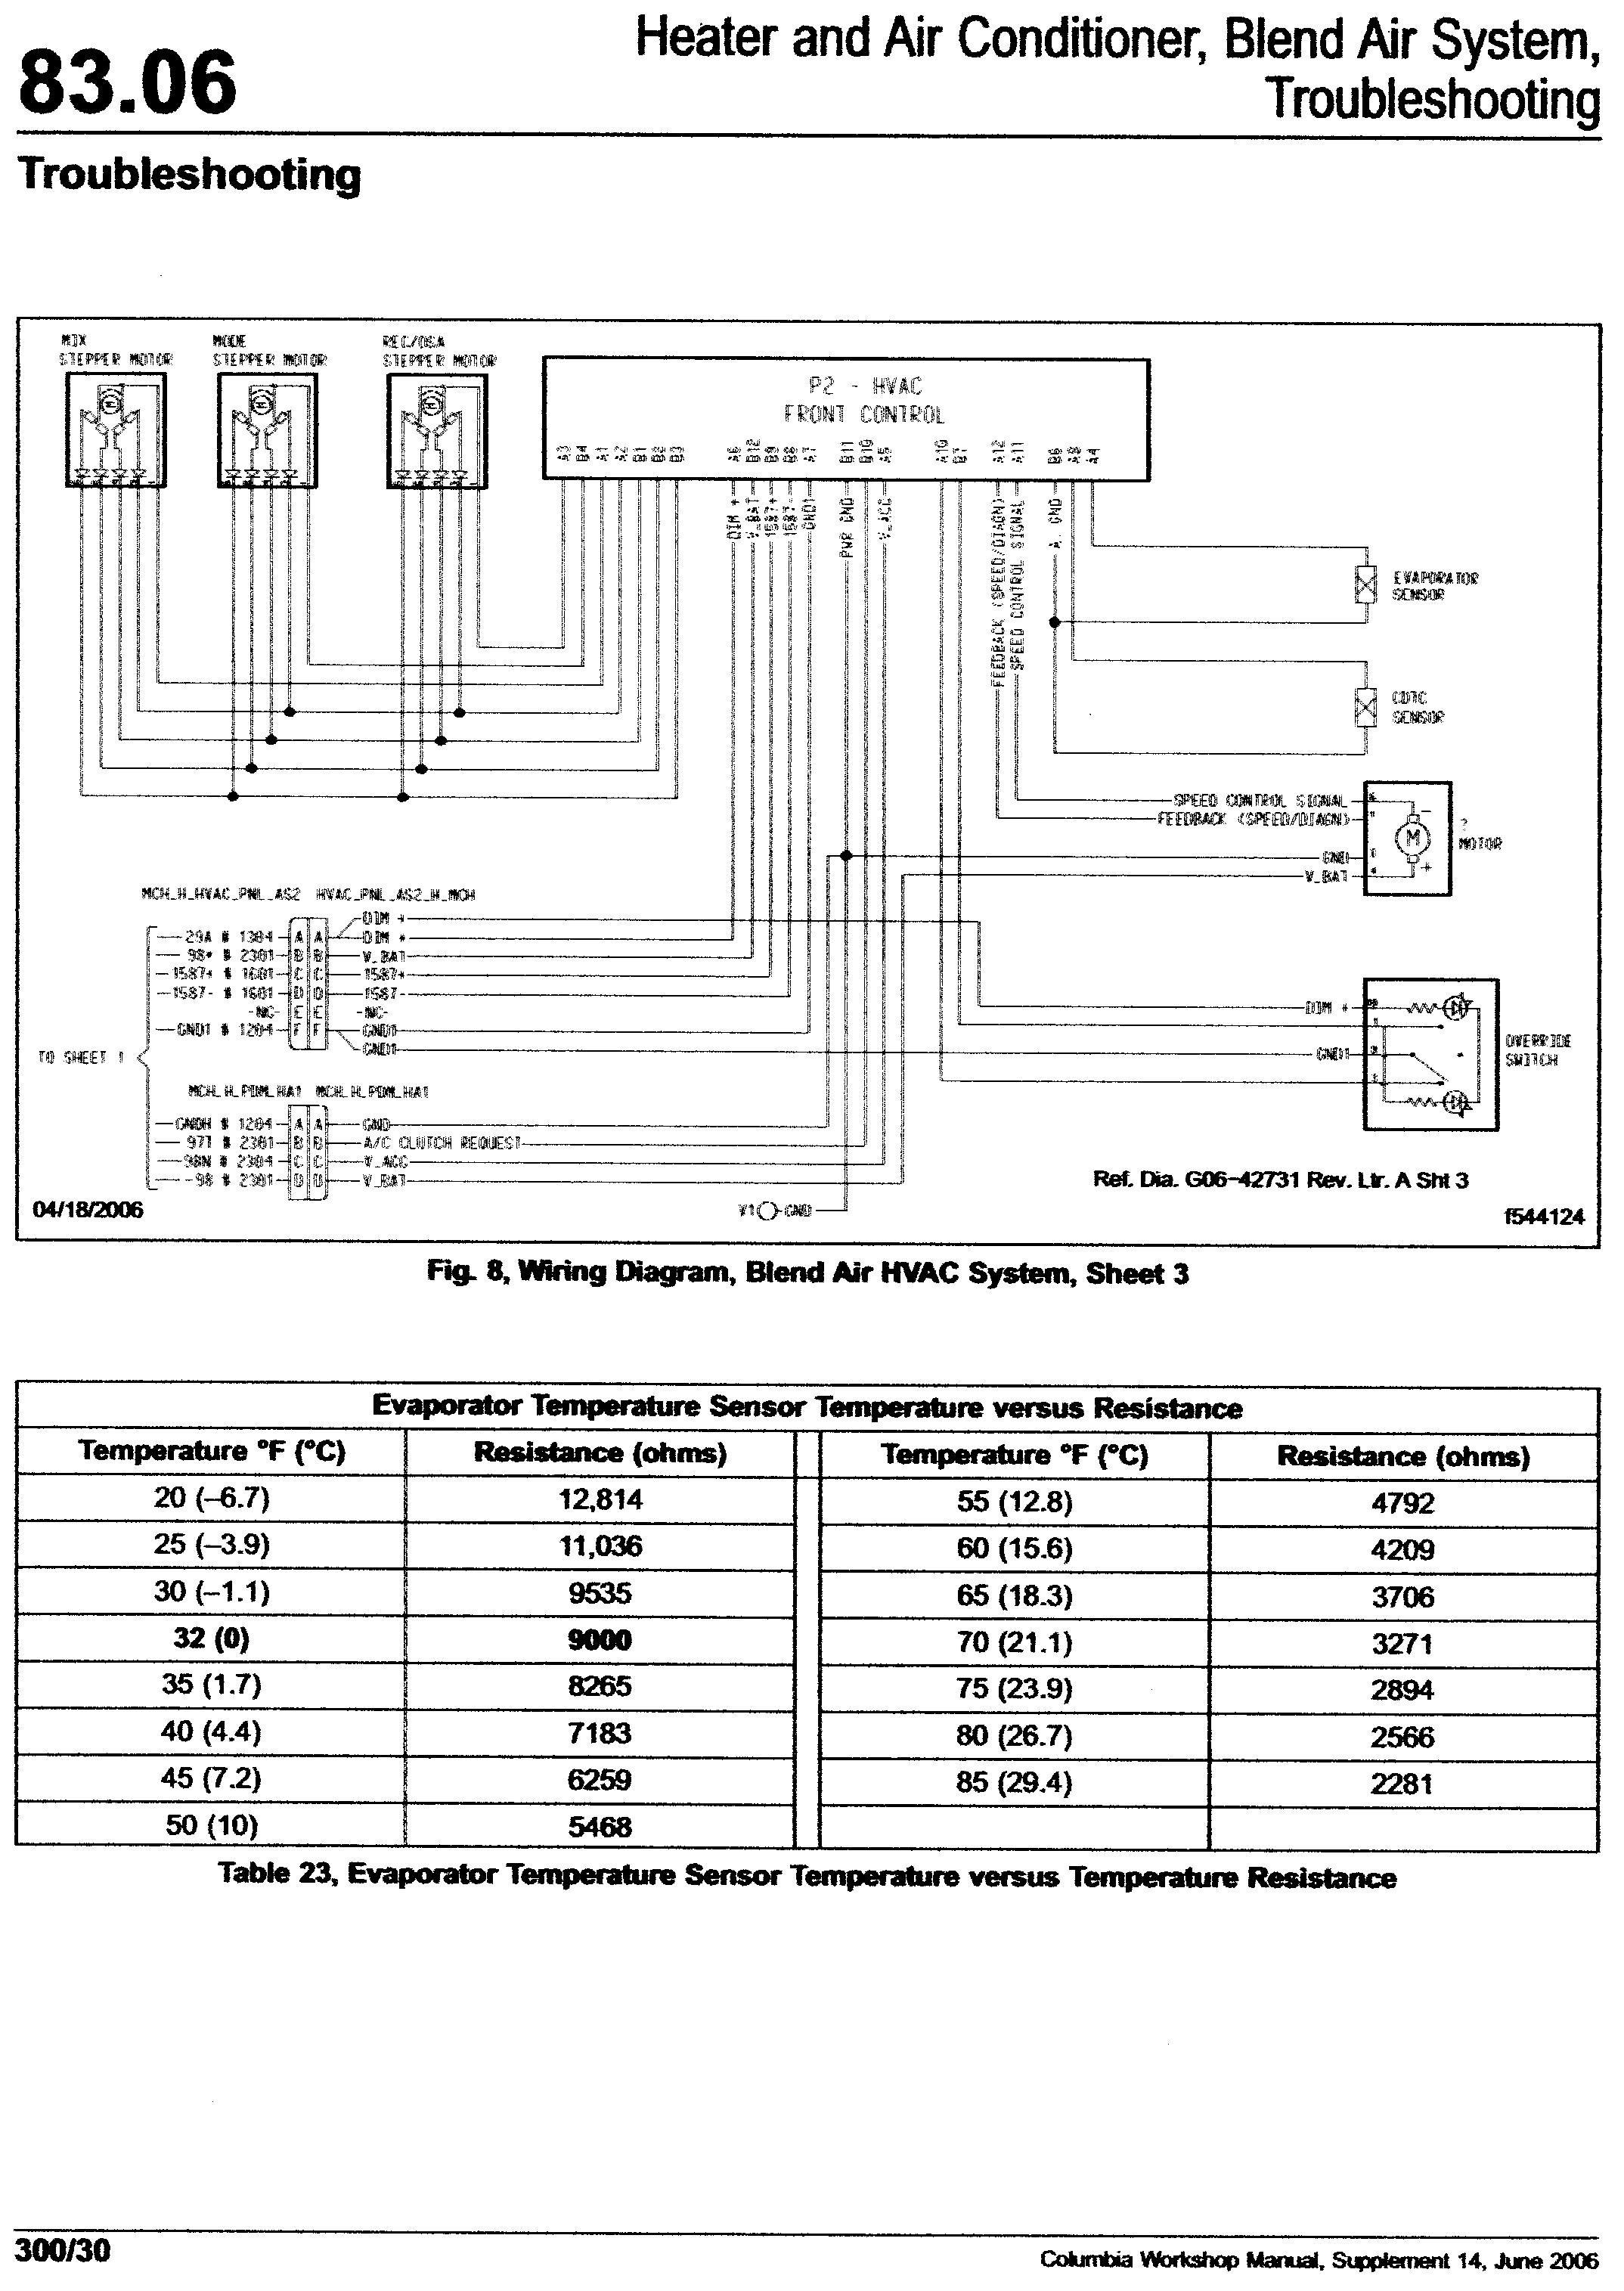 1992 Freightliner Fld Brake Light Wiring Diagram 2012 Sprinter Ecm Wiring Diagram Full Hd Version Wiring Of 1992 Freightliner Fld Brake Light Wiring Diagram